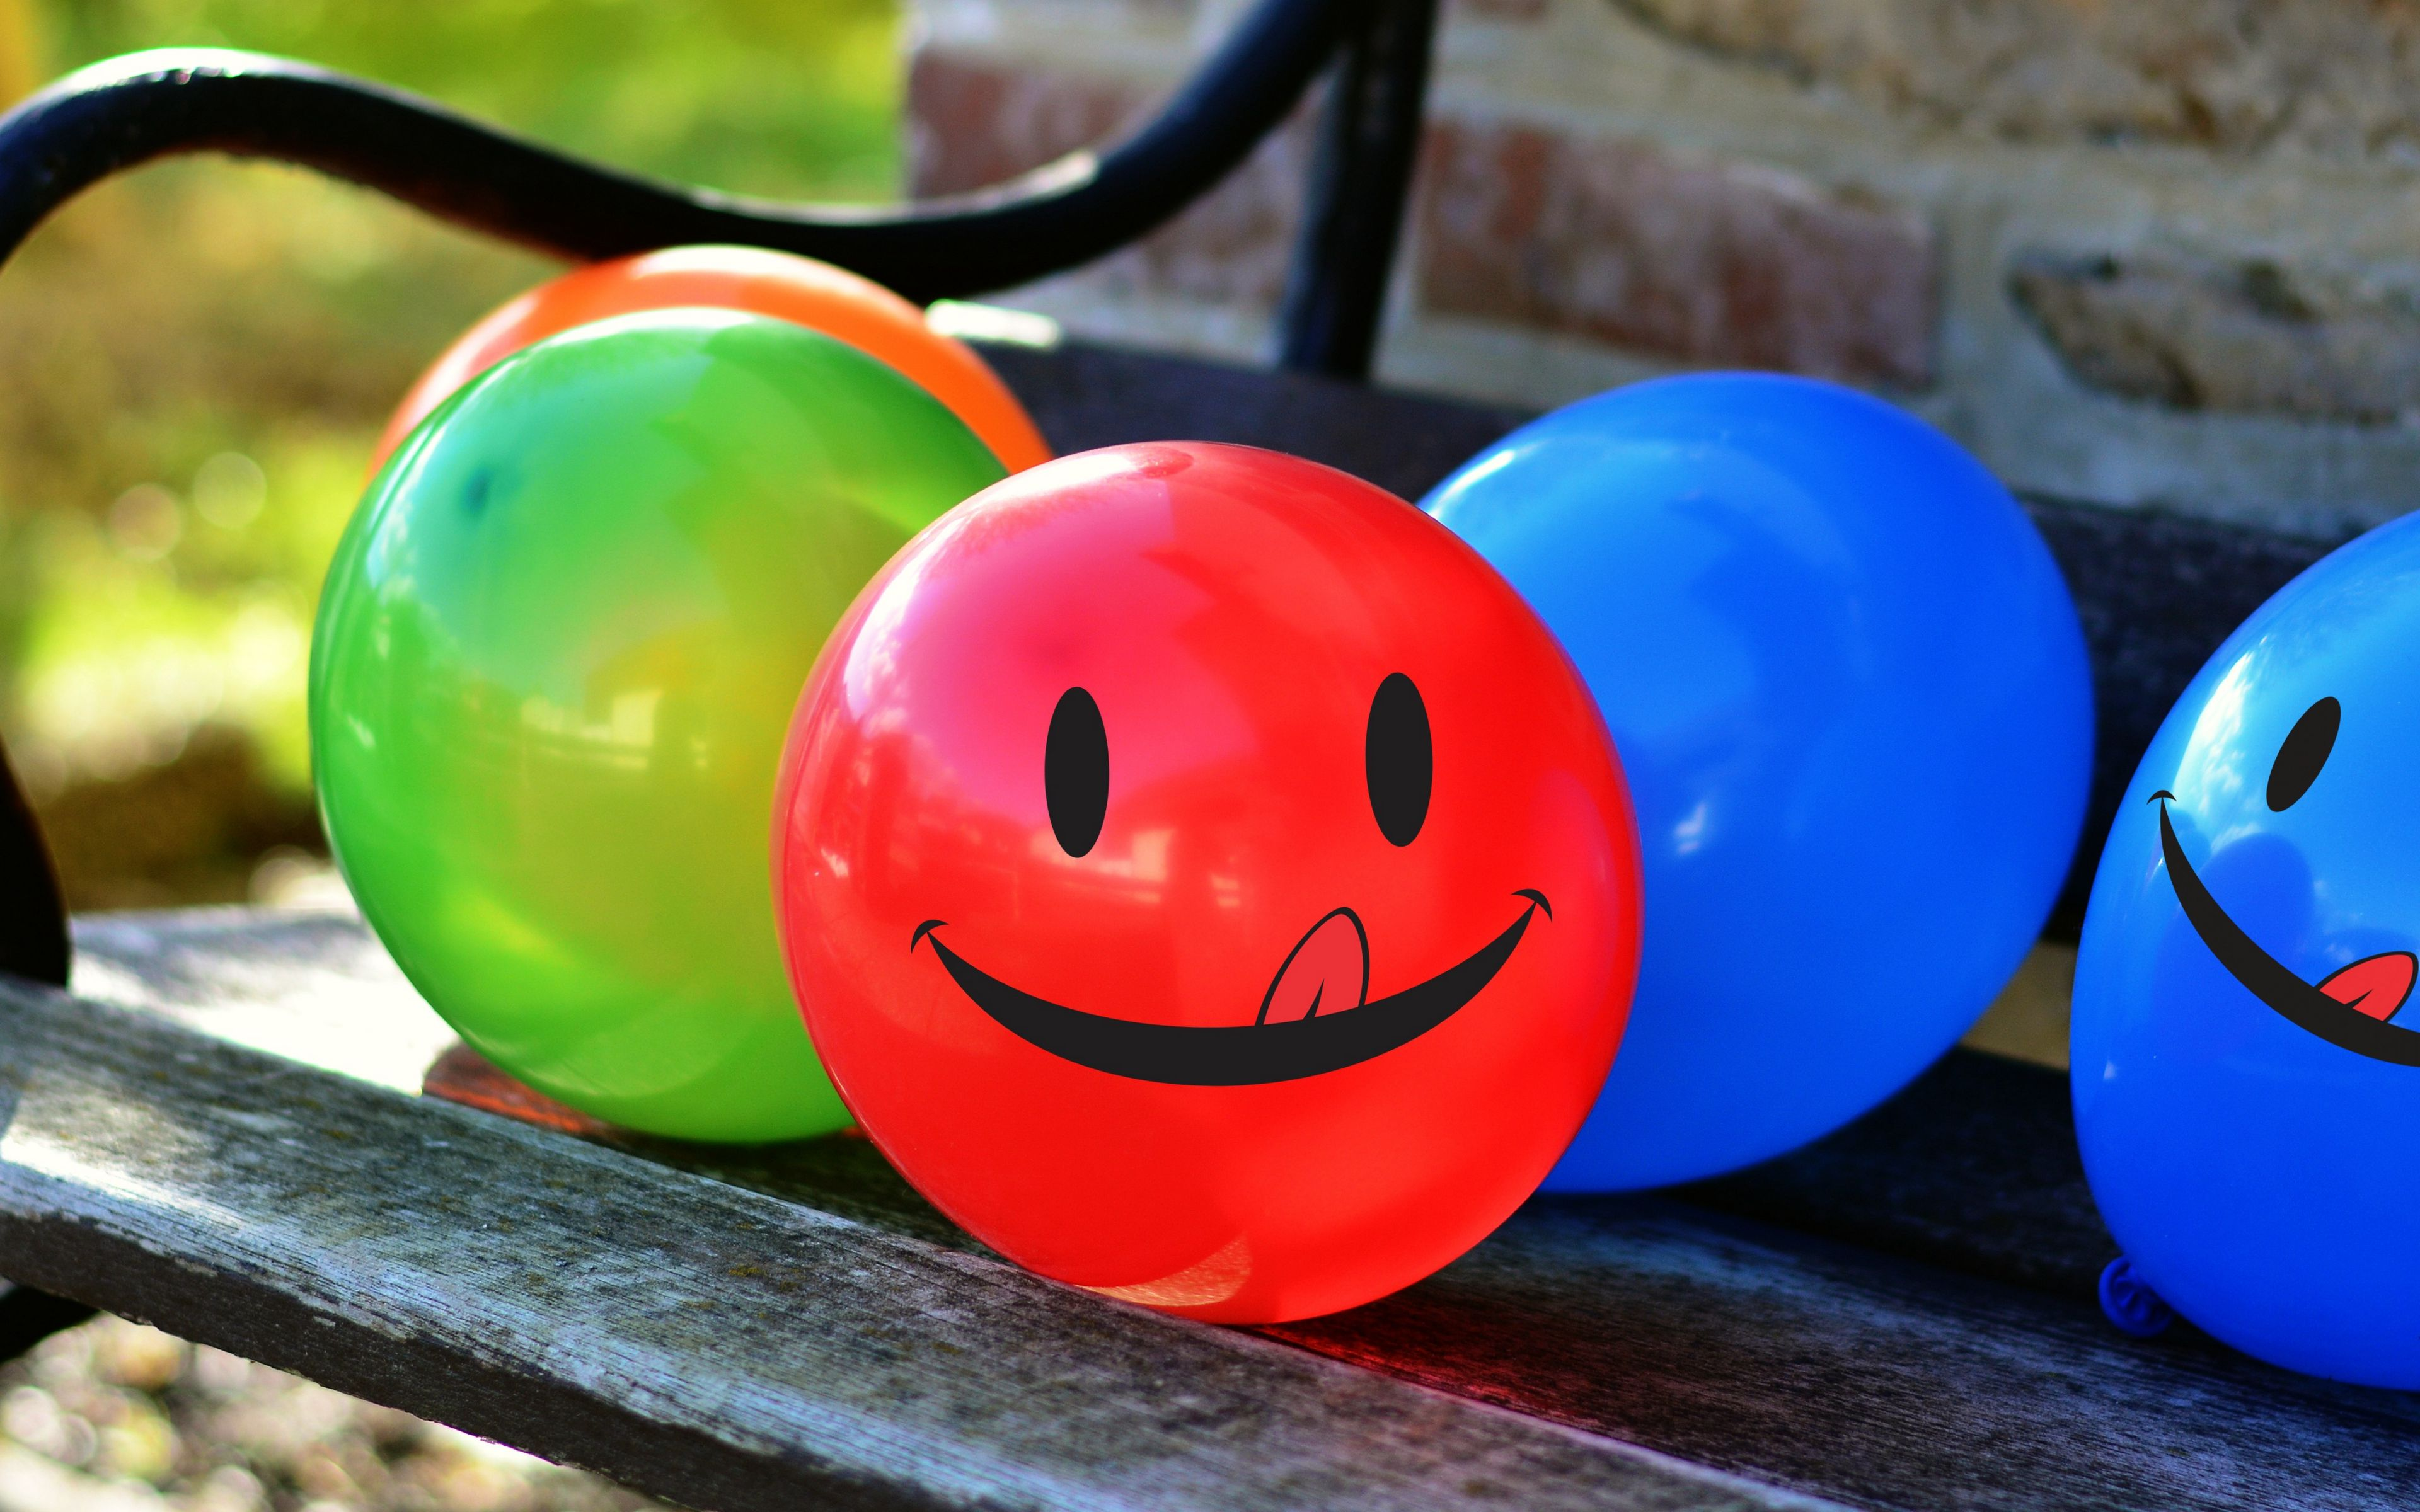 3840x2400 Wallpaper balloons, smile, smiley, colorful